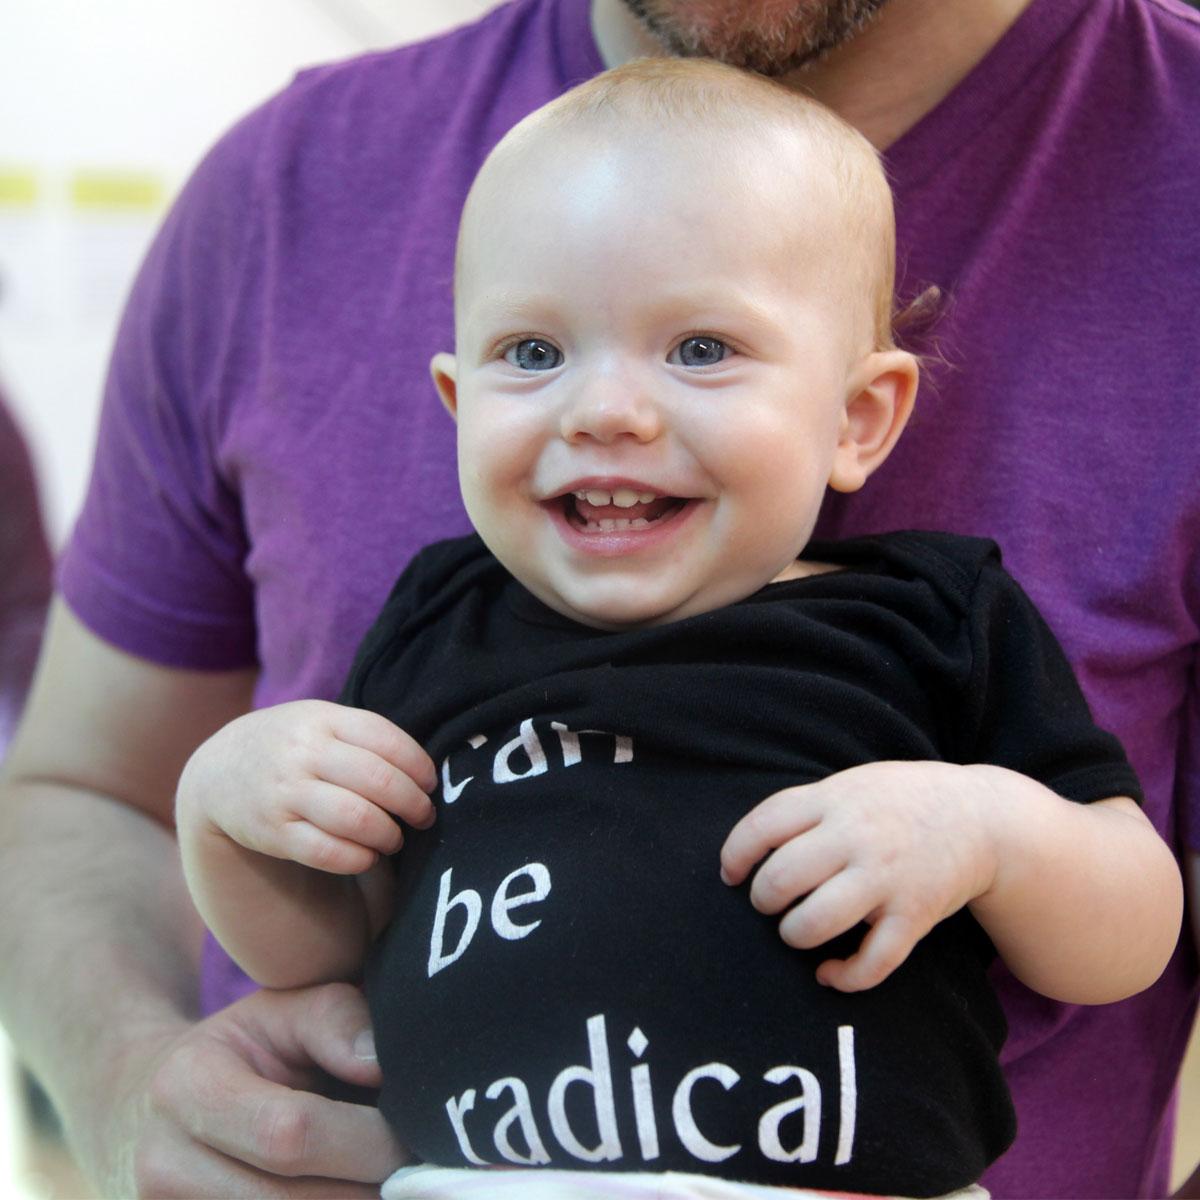 Radical_baby.jpg